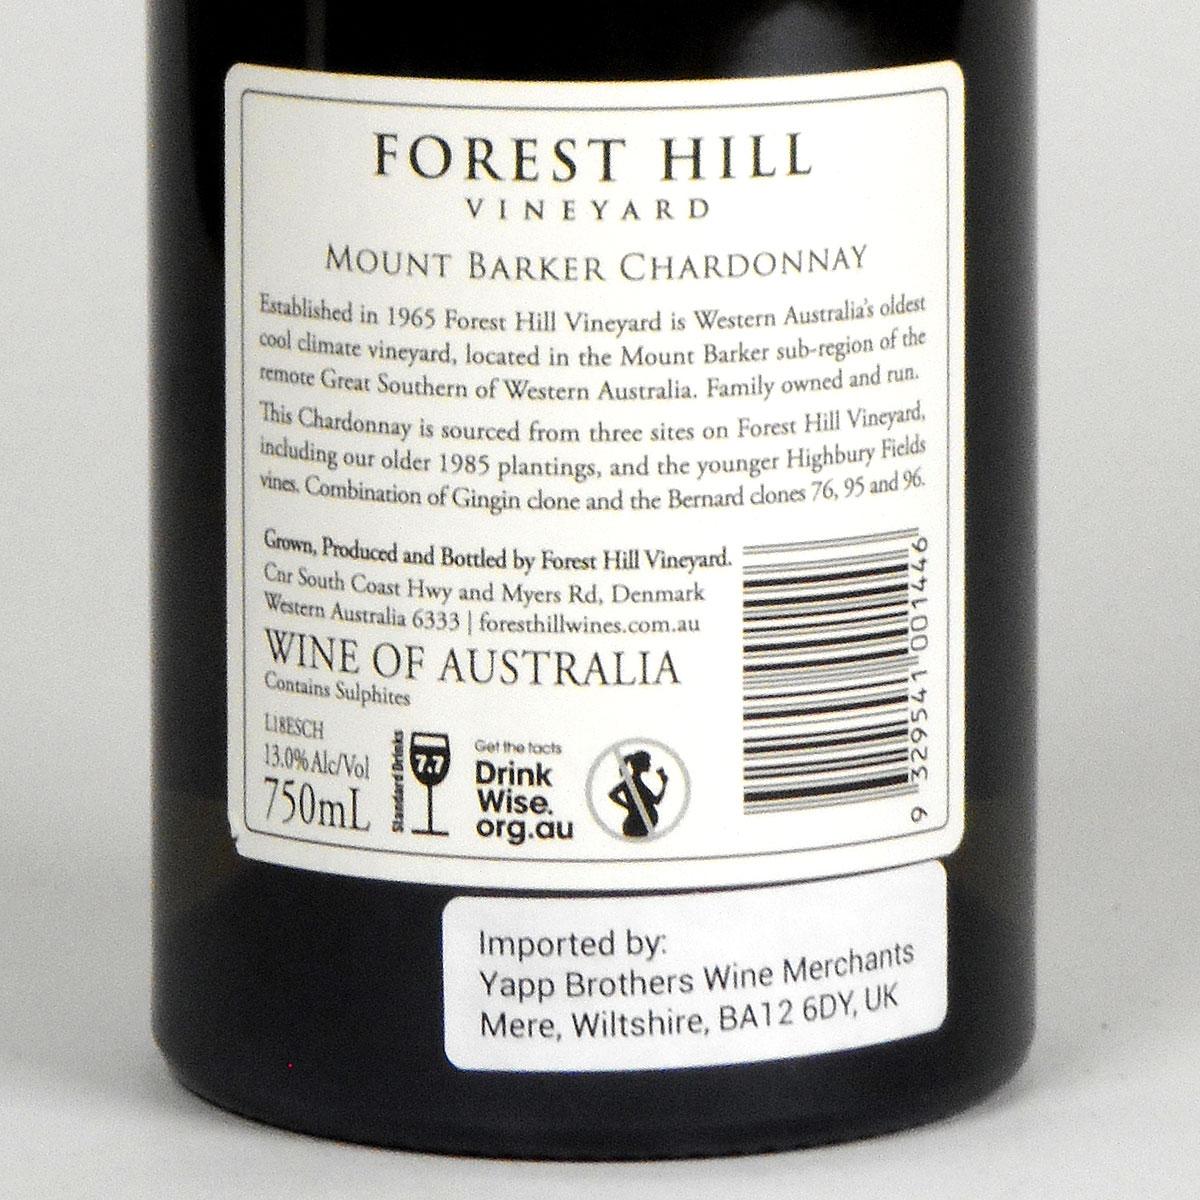 Forest Hill Vineyard: 'Estate' Chardonnay 2018 - Bottle Rear Label